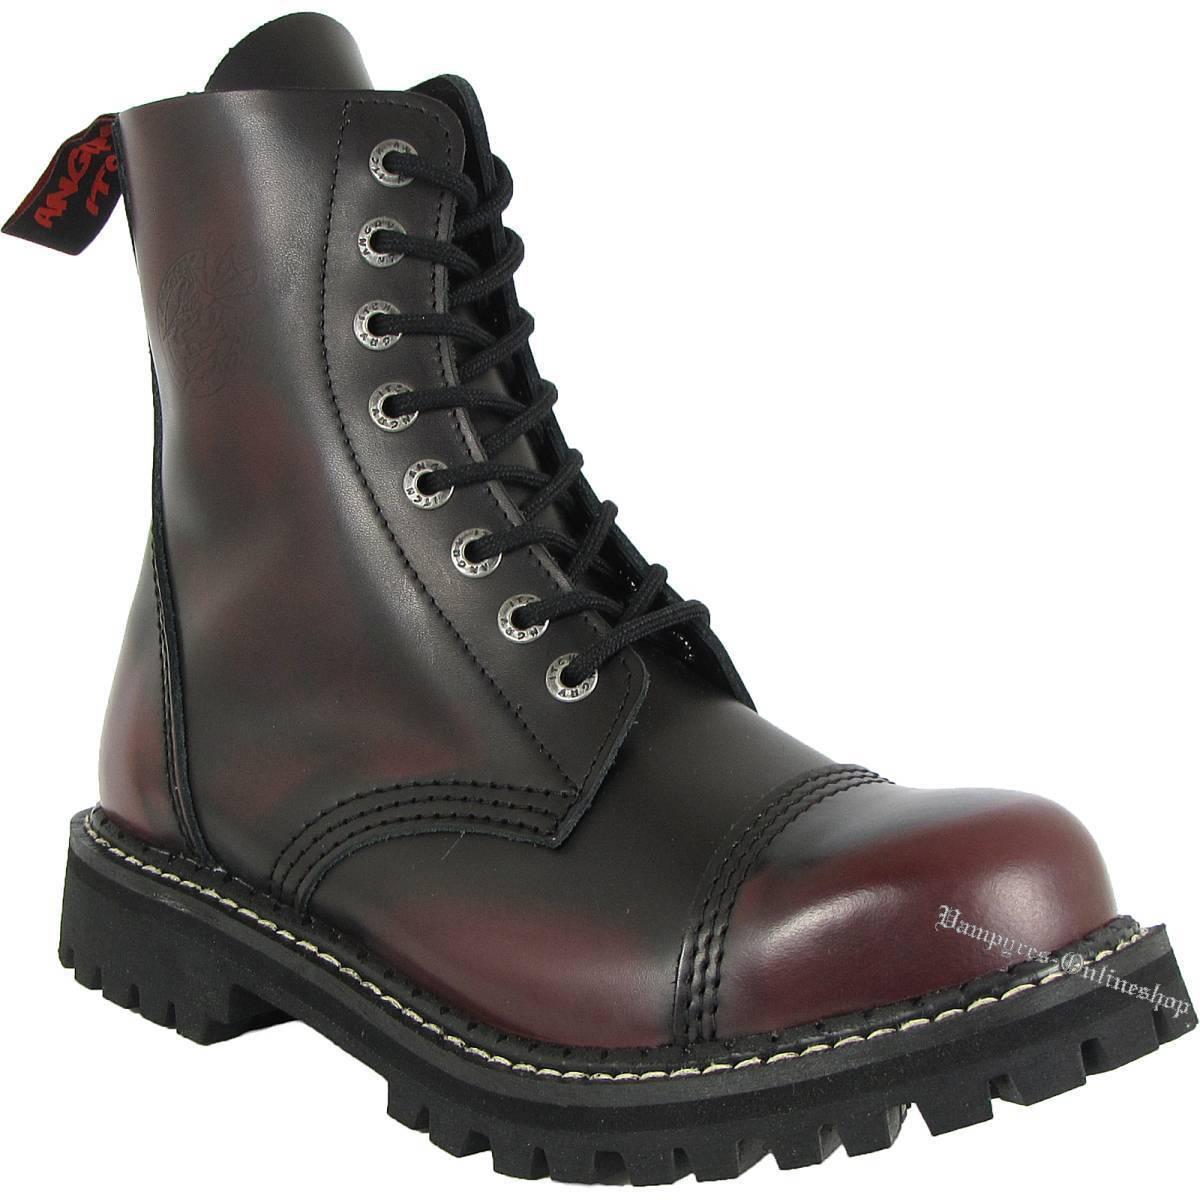 073e36b4f3f Angry Itch 8 agujeros Burgundy Rub-off rojo negro rangers botas acero tapas  red